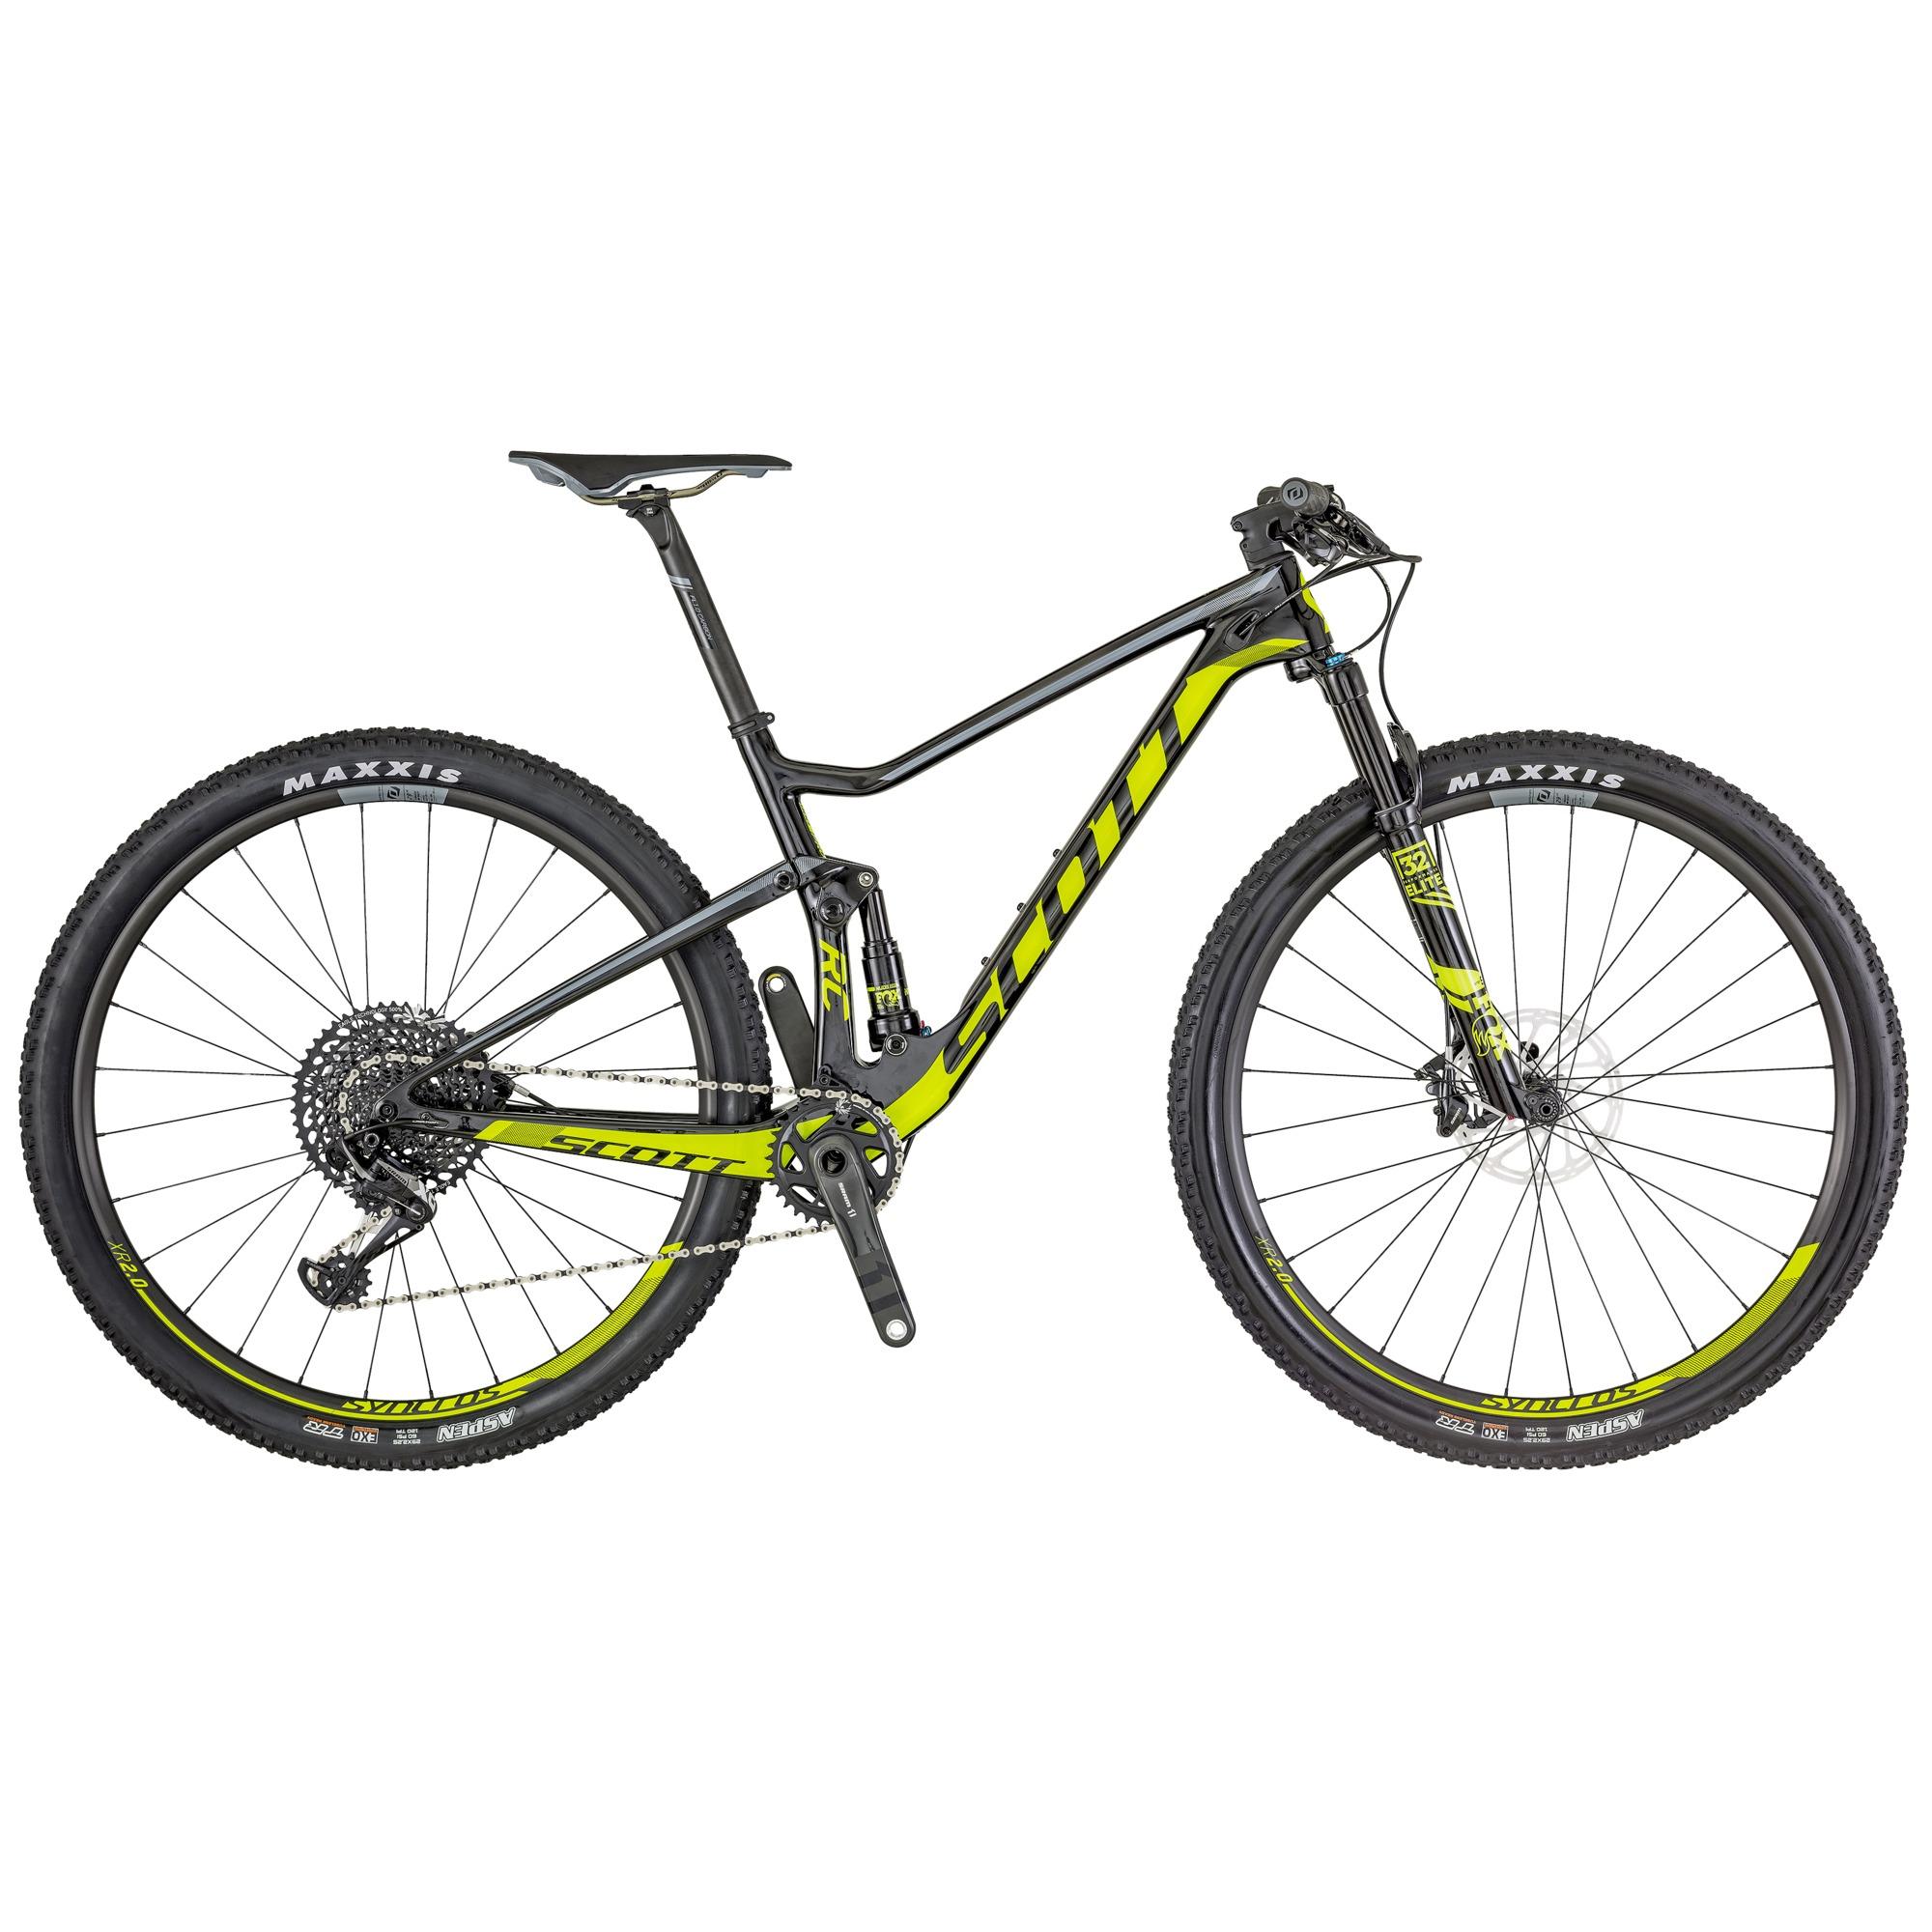 SCOTT Spark RC 900 Pro Bike M - Rad & Dämpferklinik GmbH